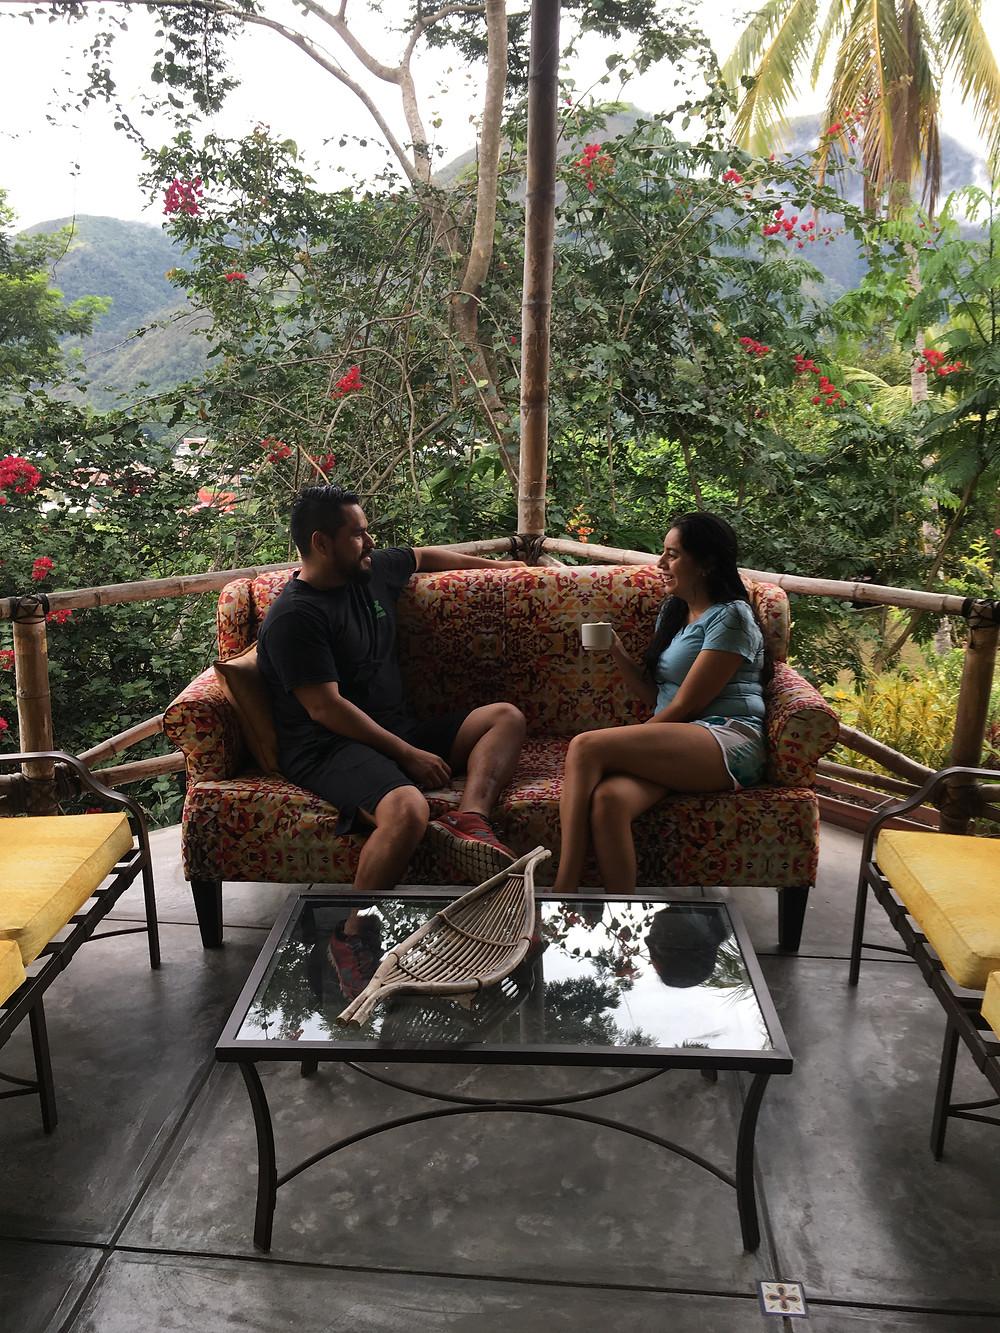 Relaxing at the Peru eco-lodge in La Merced -- El Fundo San Jose